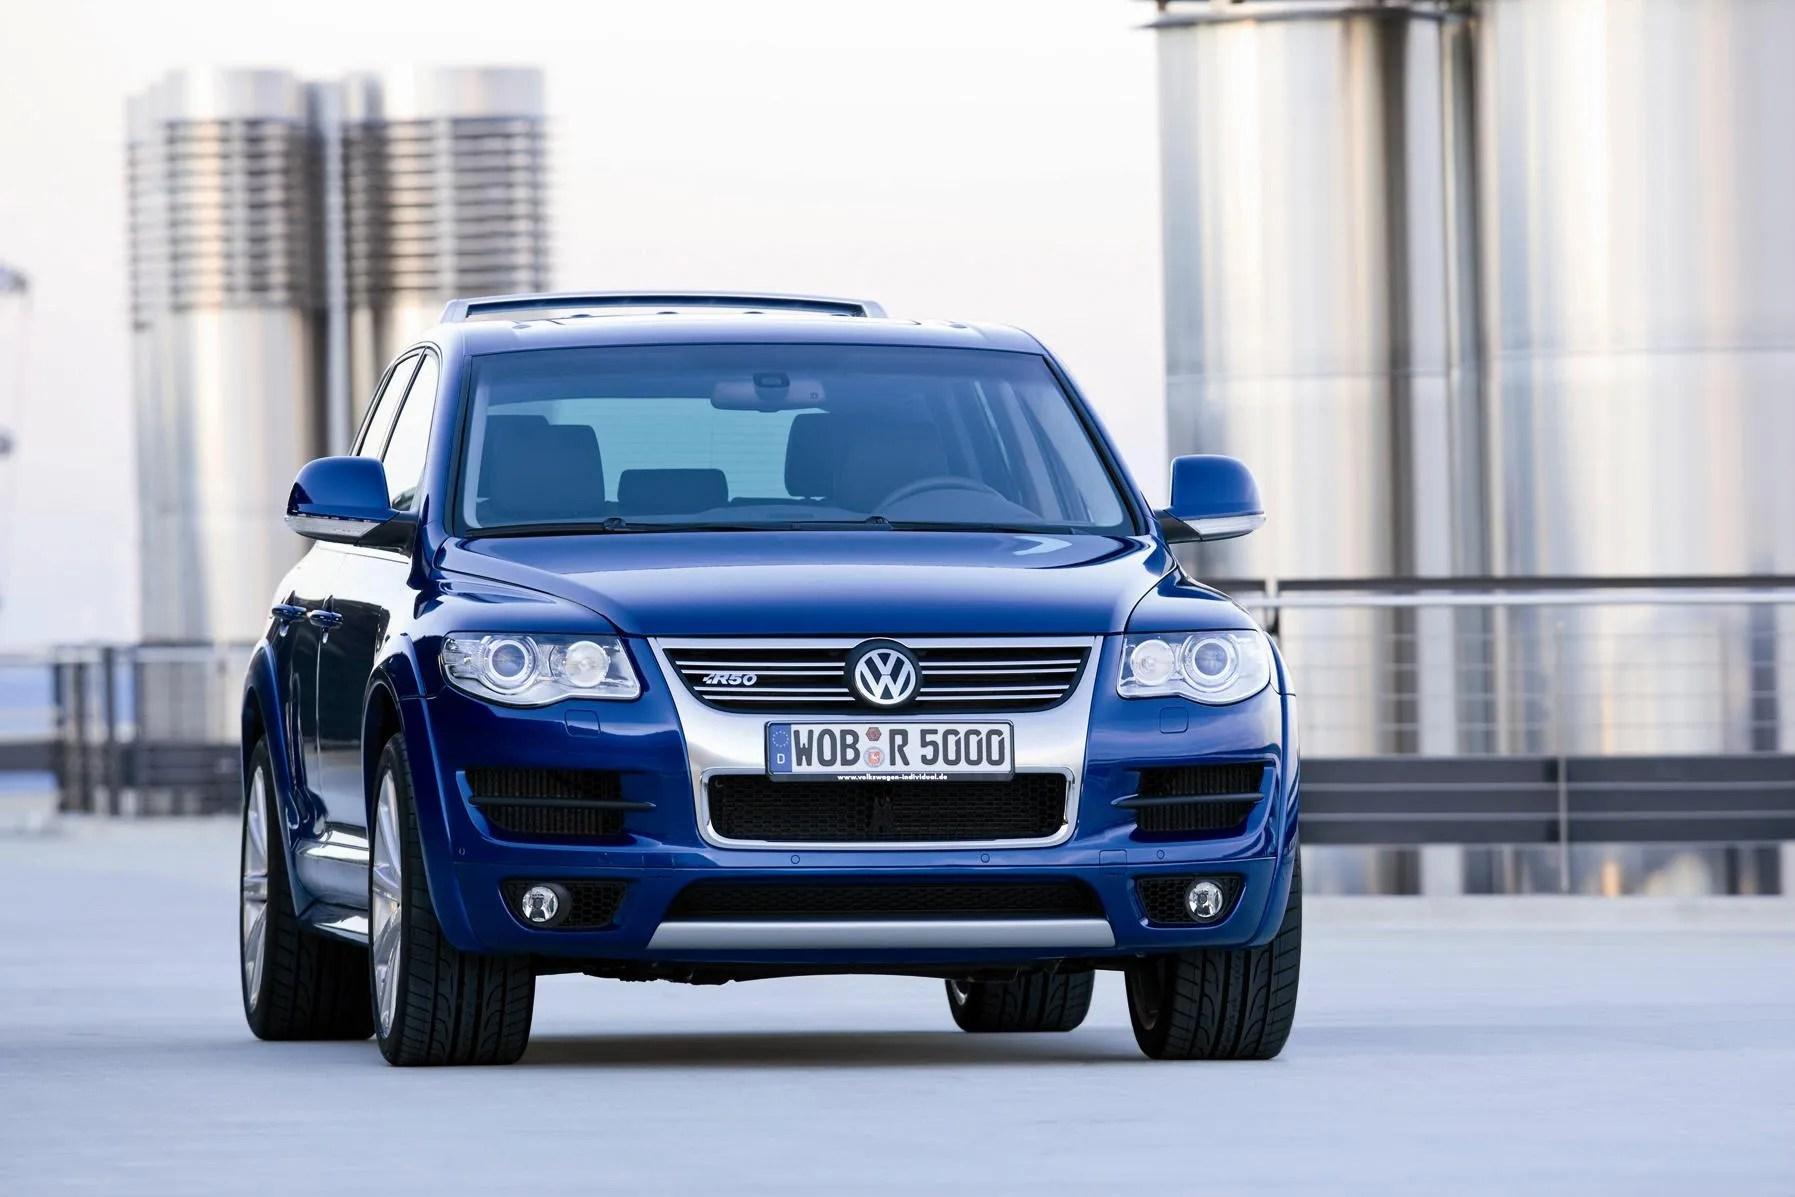 2008 Volkswagen Touareg R50 Top Speed